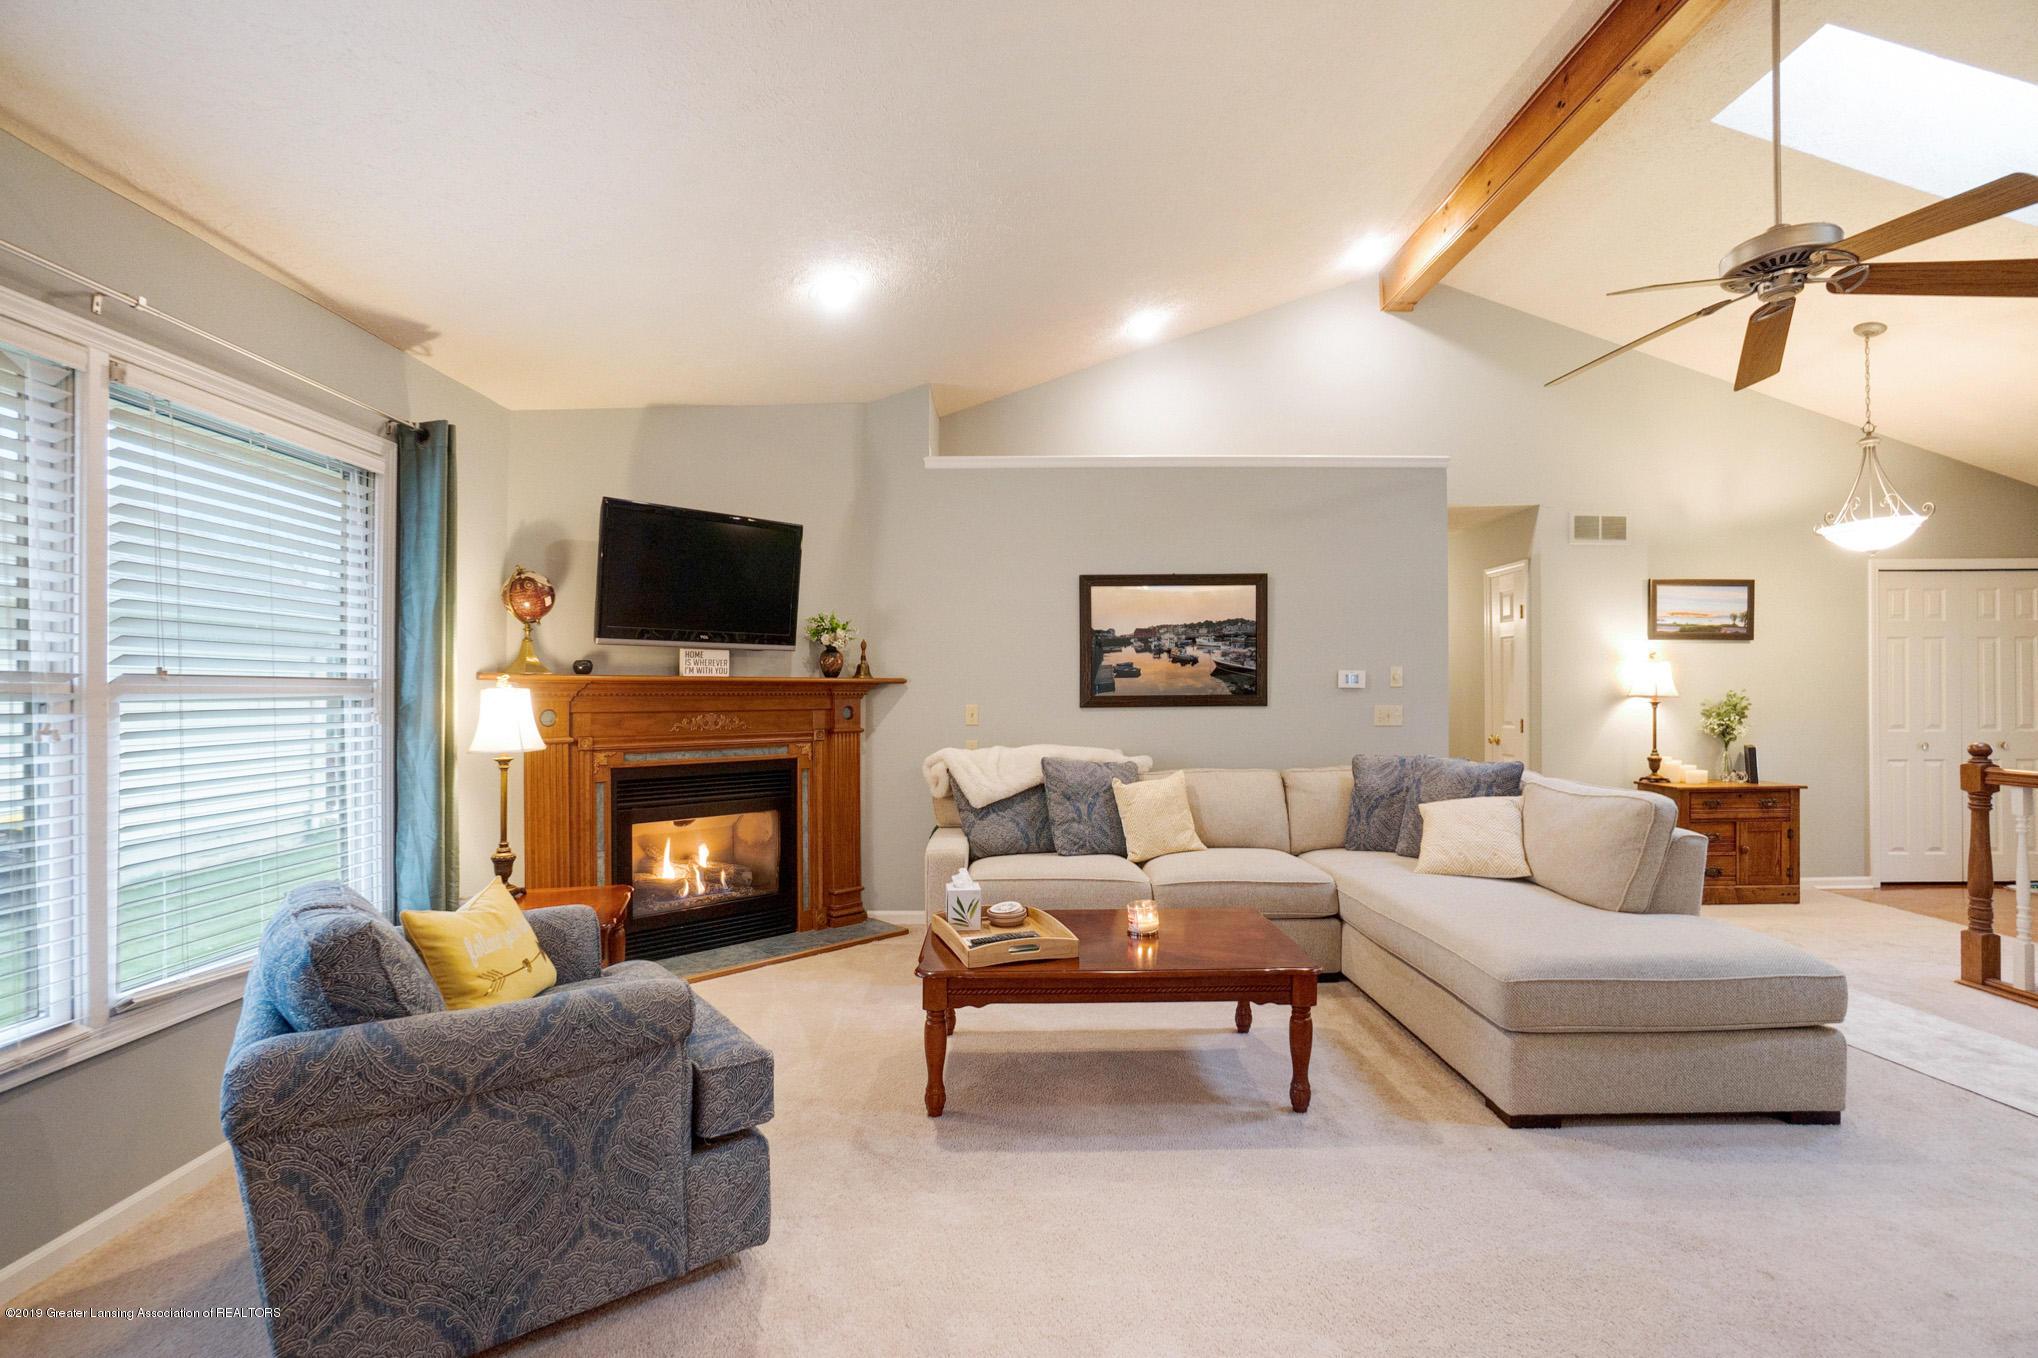 2540 Cunningham Dr - Living Room - 7